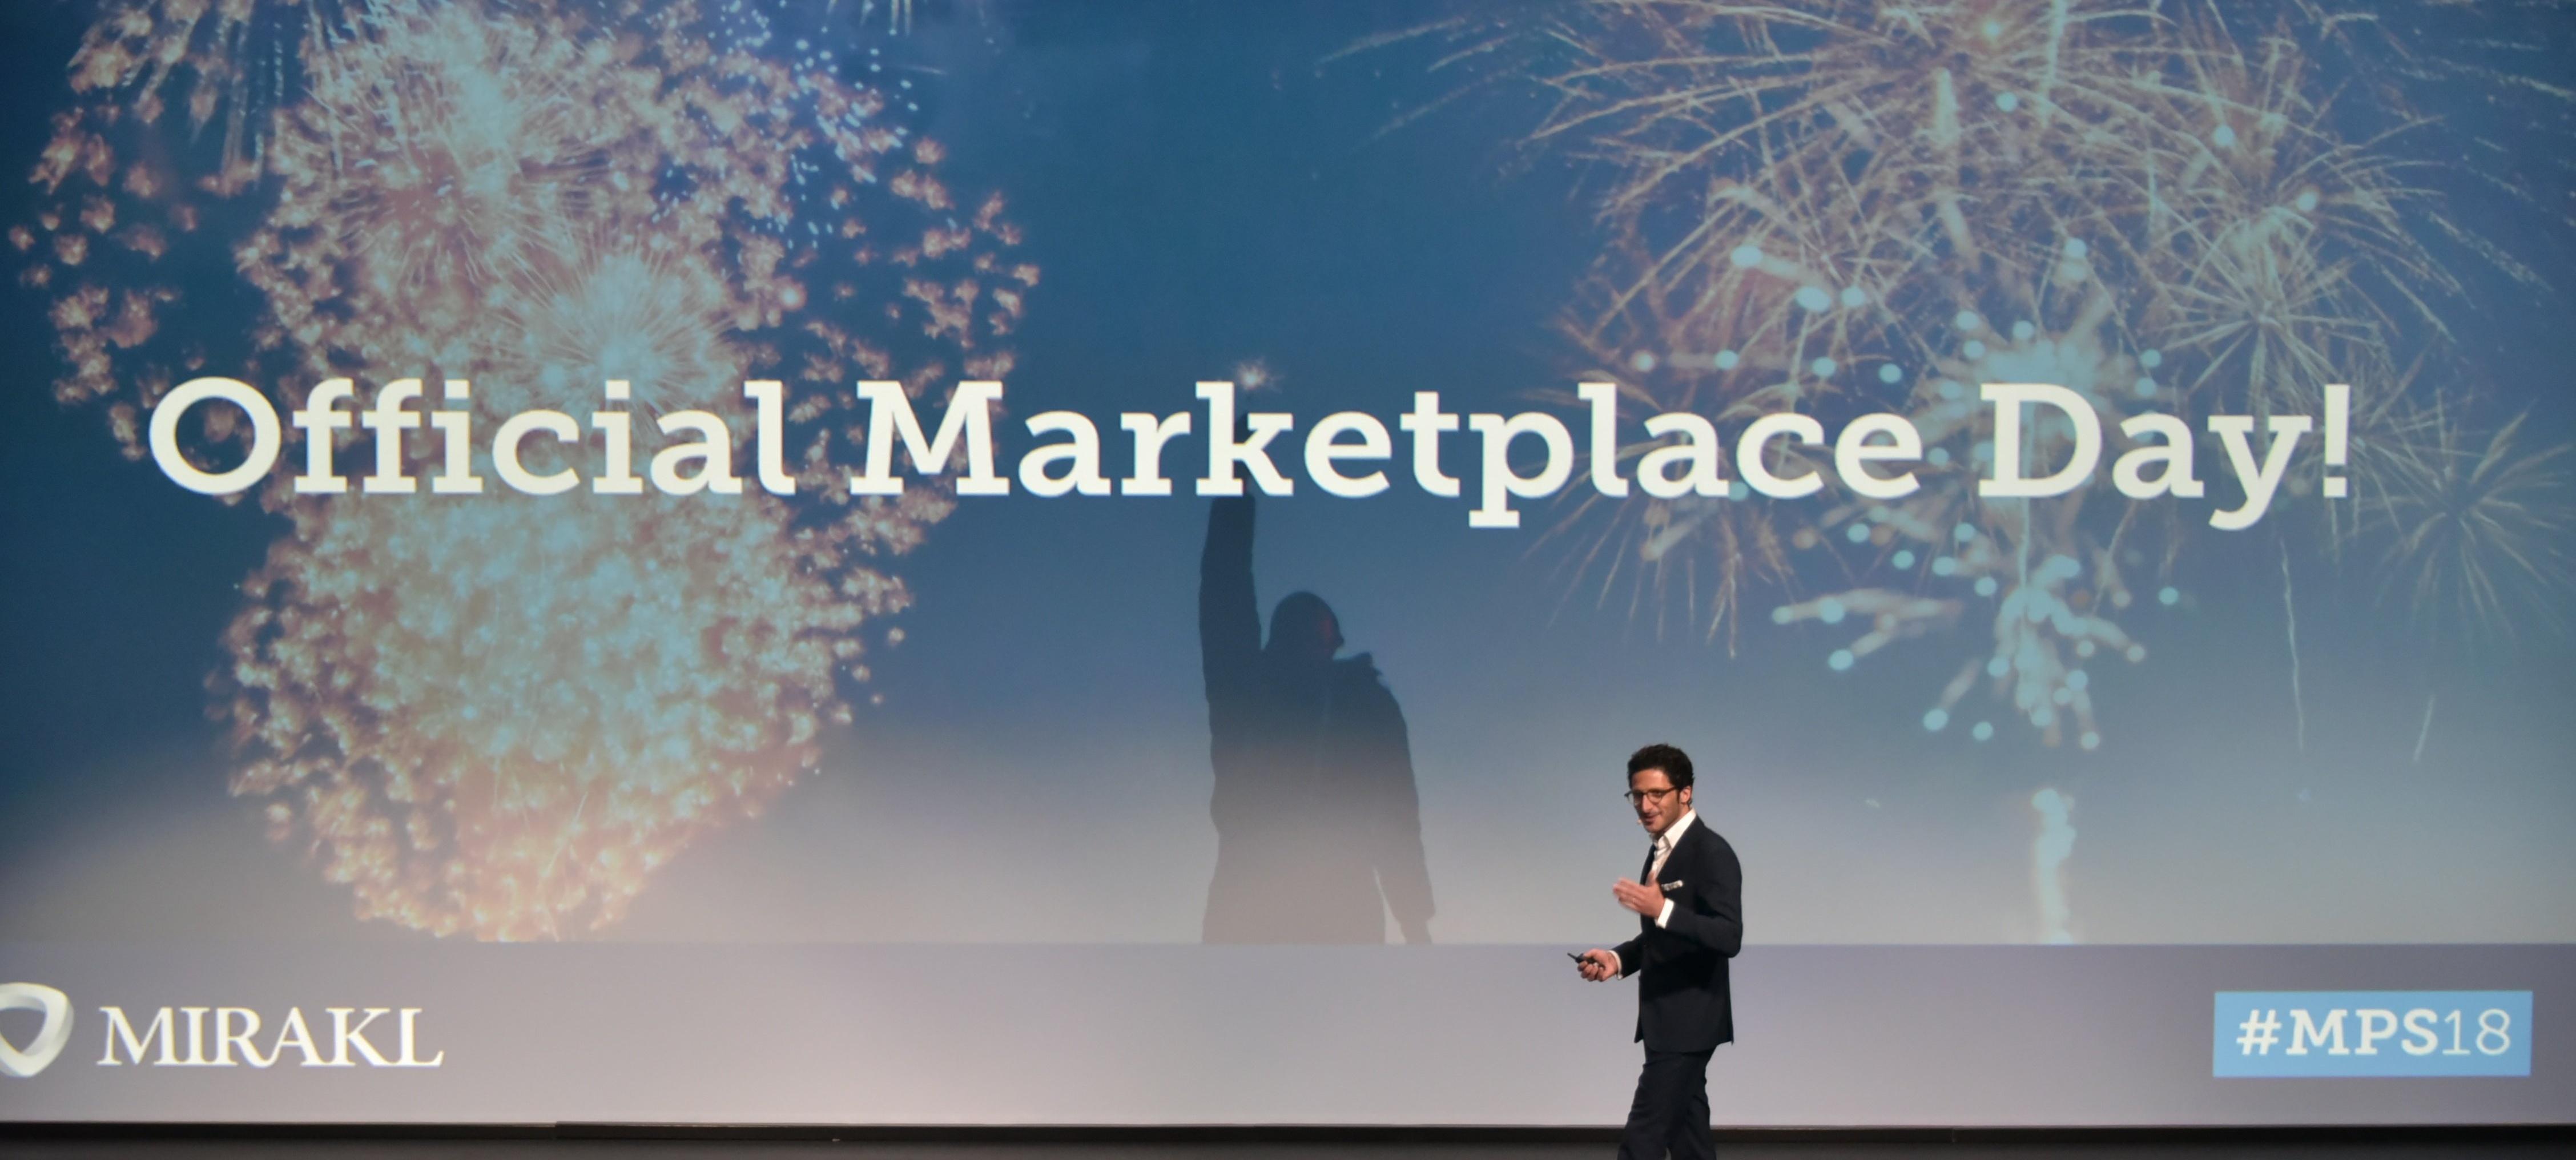 Mirakl Marketplace Day-508799-edited